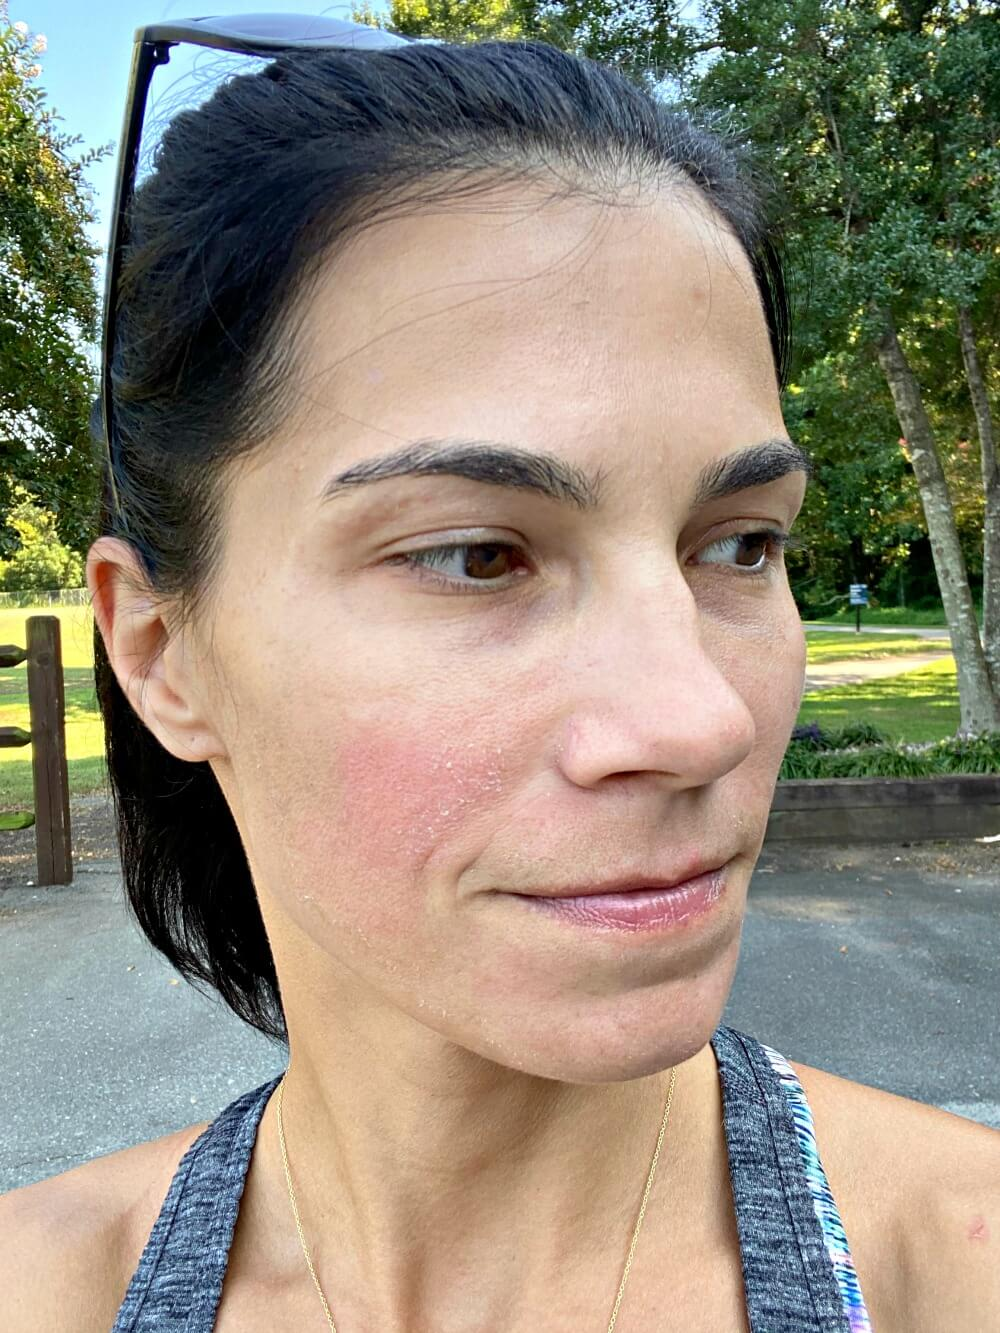 four days post-vampire facial